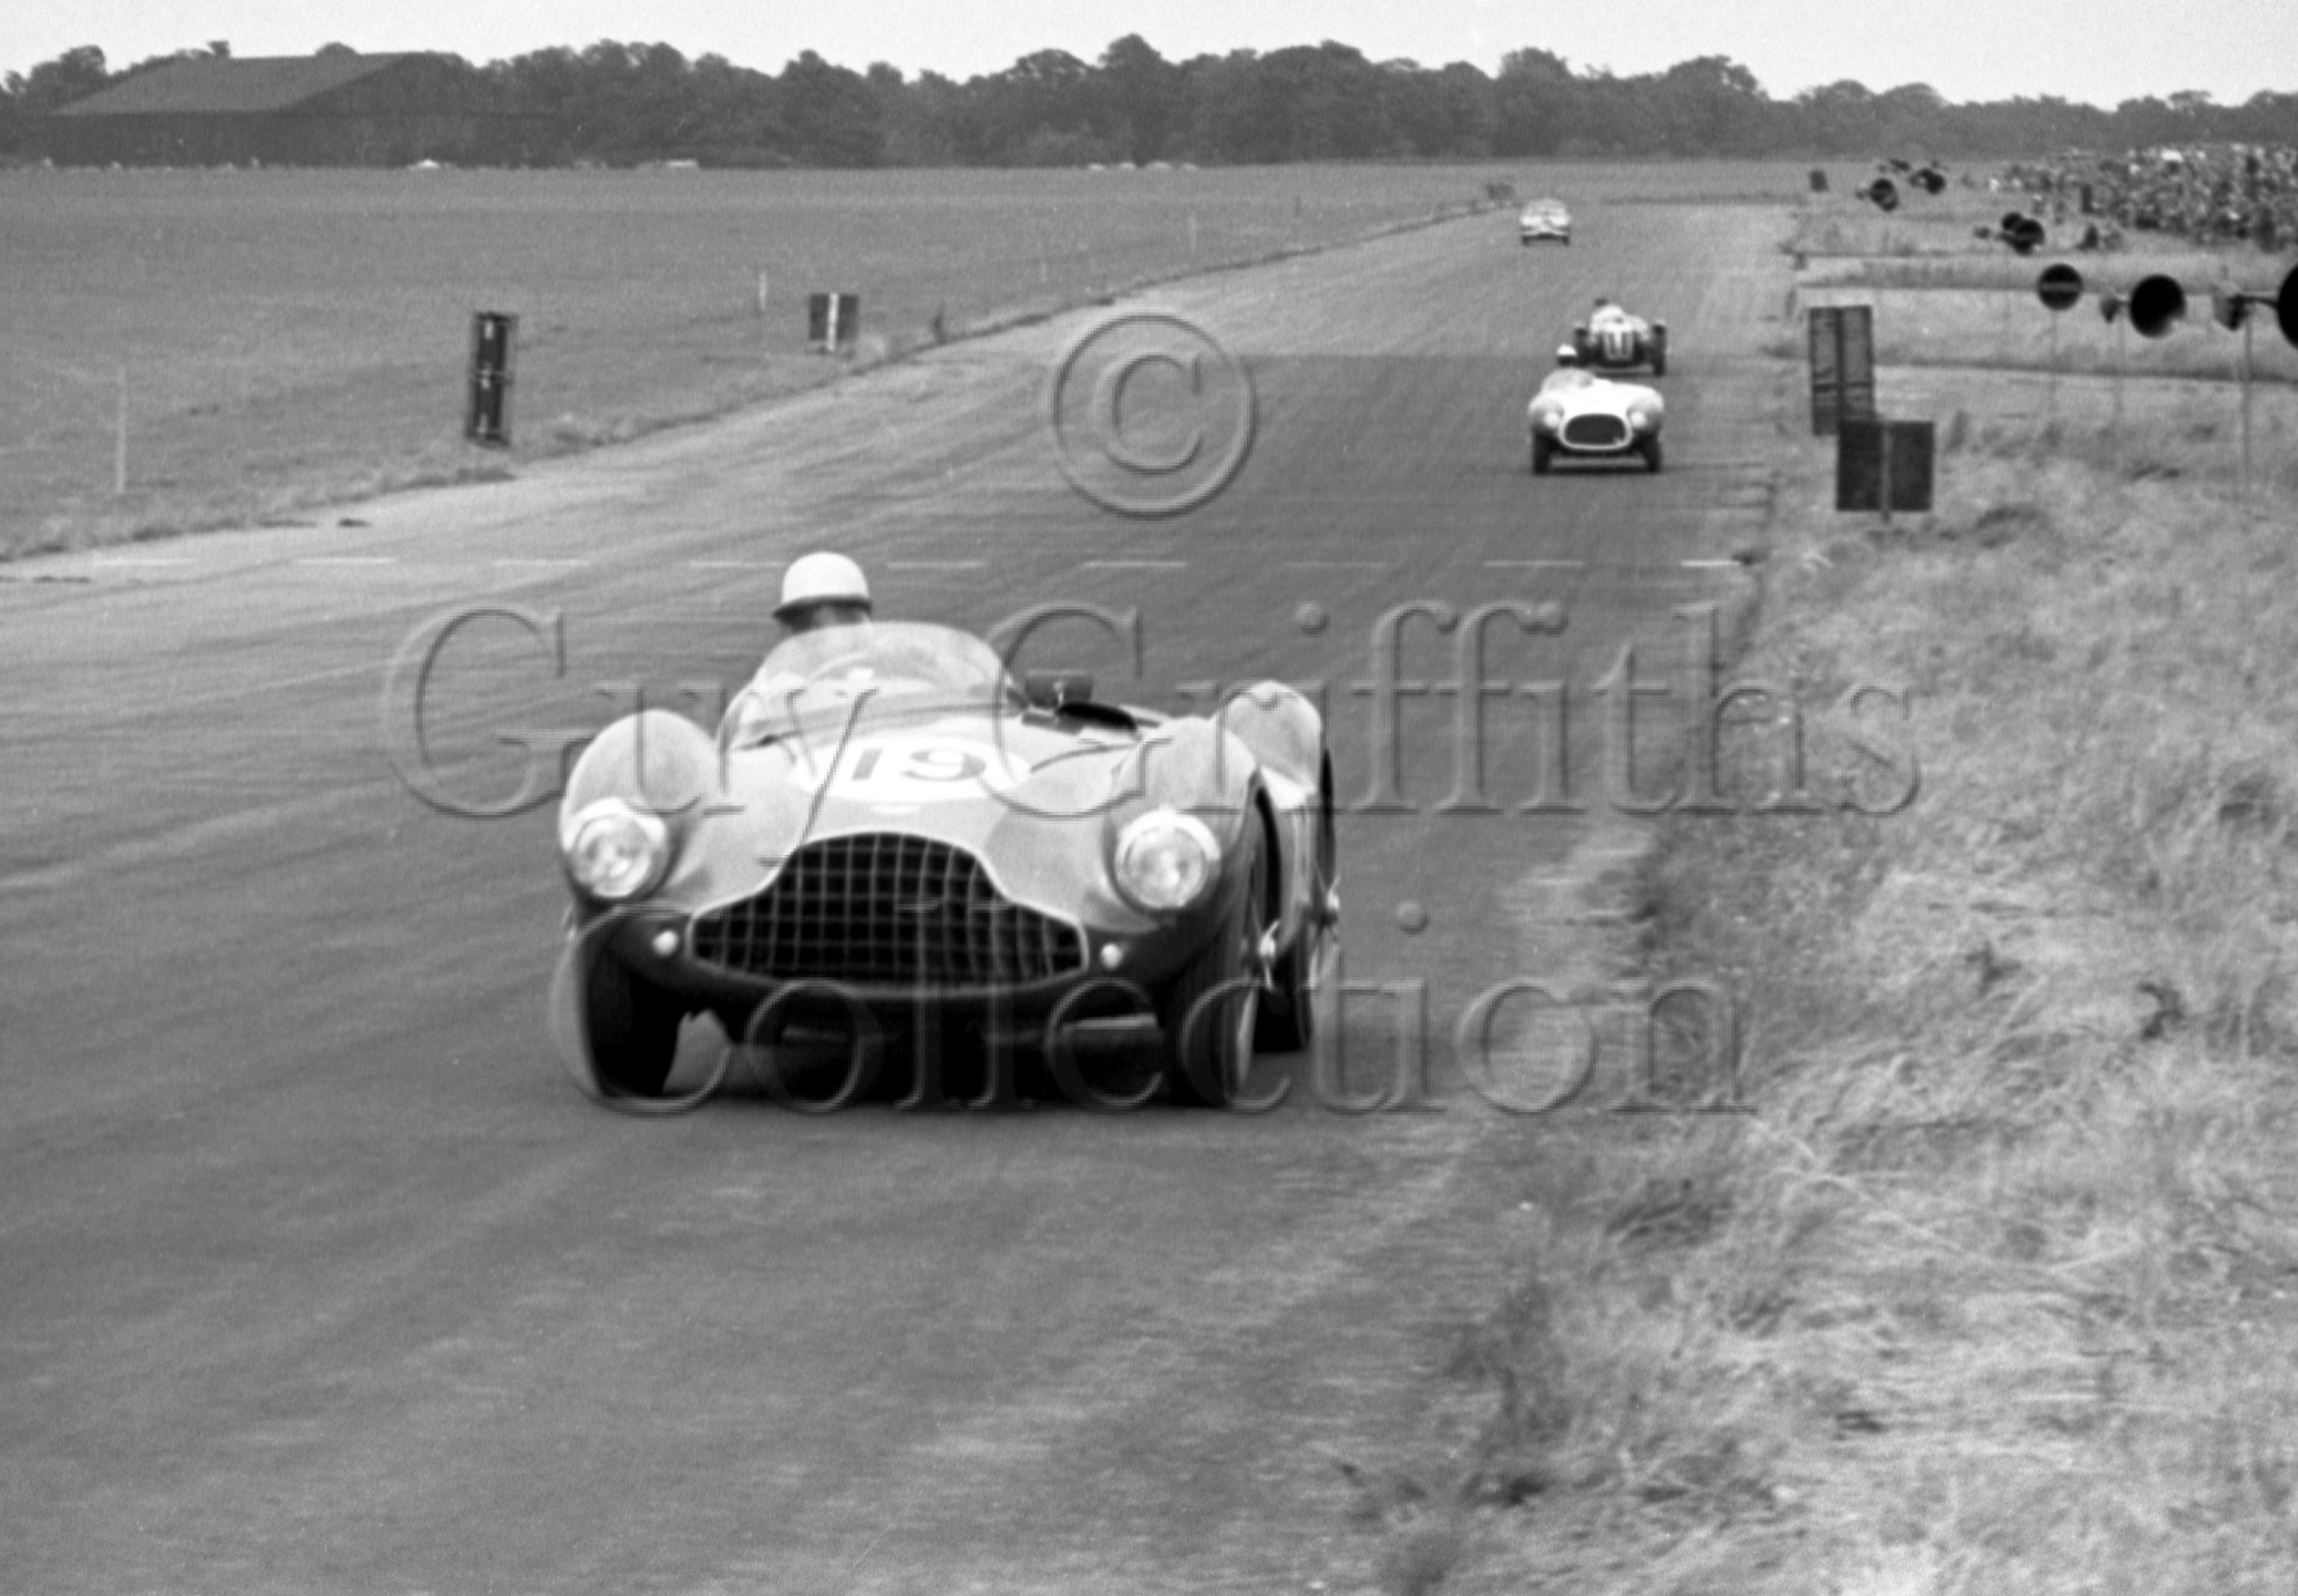 74-124–R-Salvadori–Aston-Martin–Silverstone–18-07-1953.jpg - The Guy Griffiths Collection